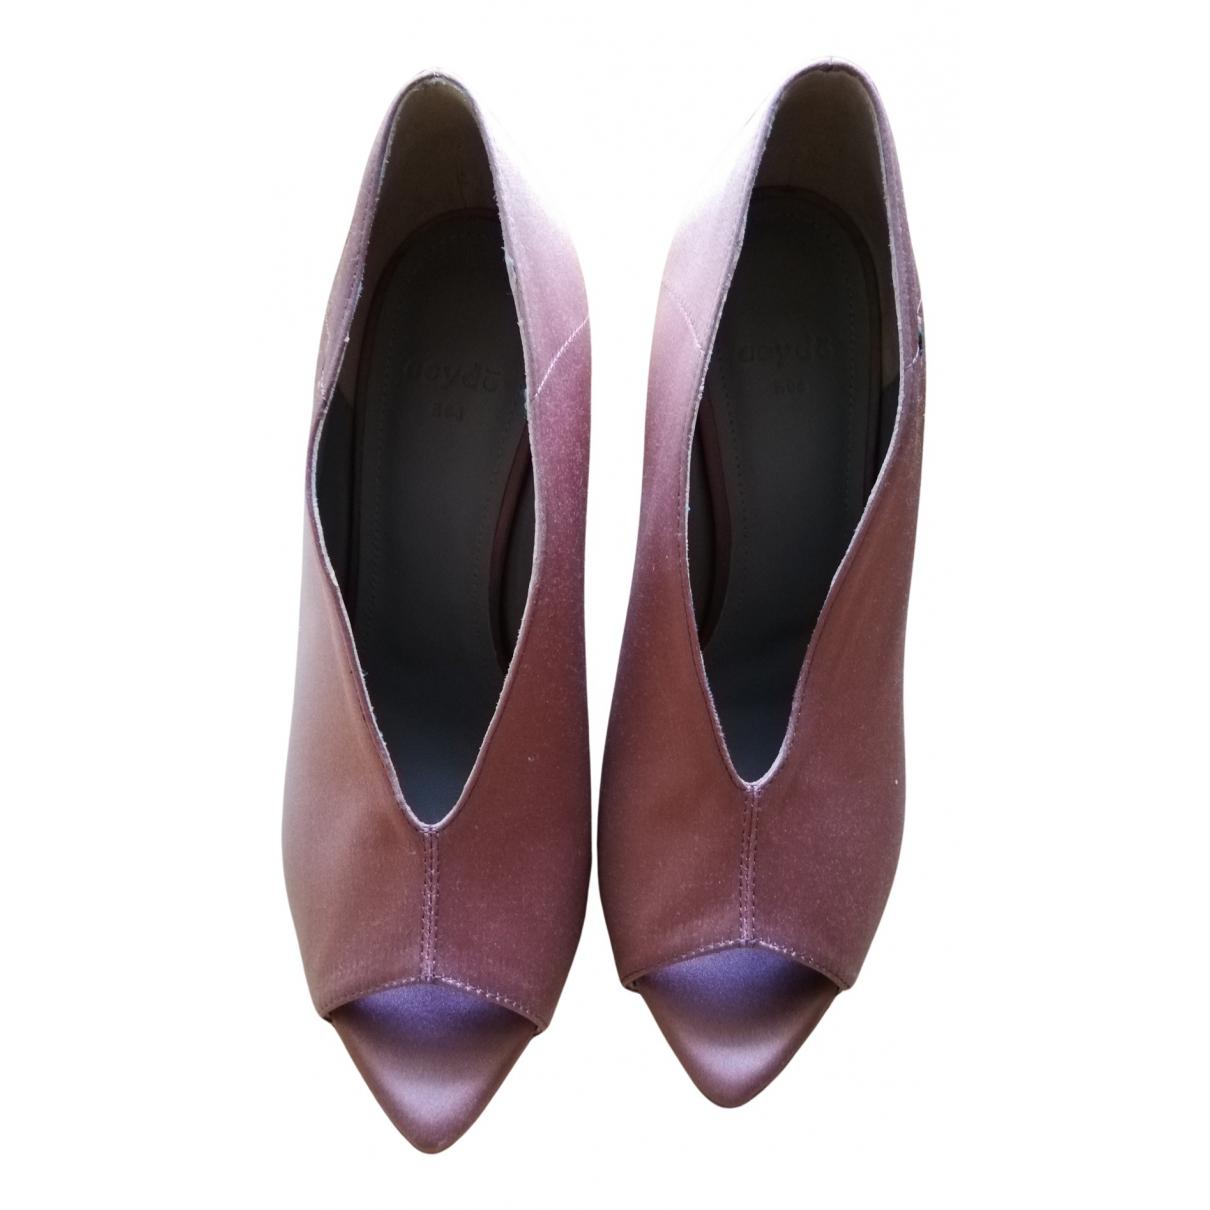 Aeyde N Pink Cloth Heels for Women 37.5 EU